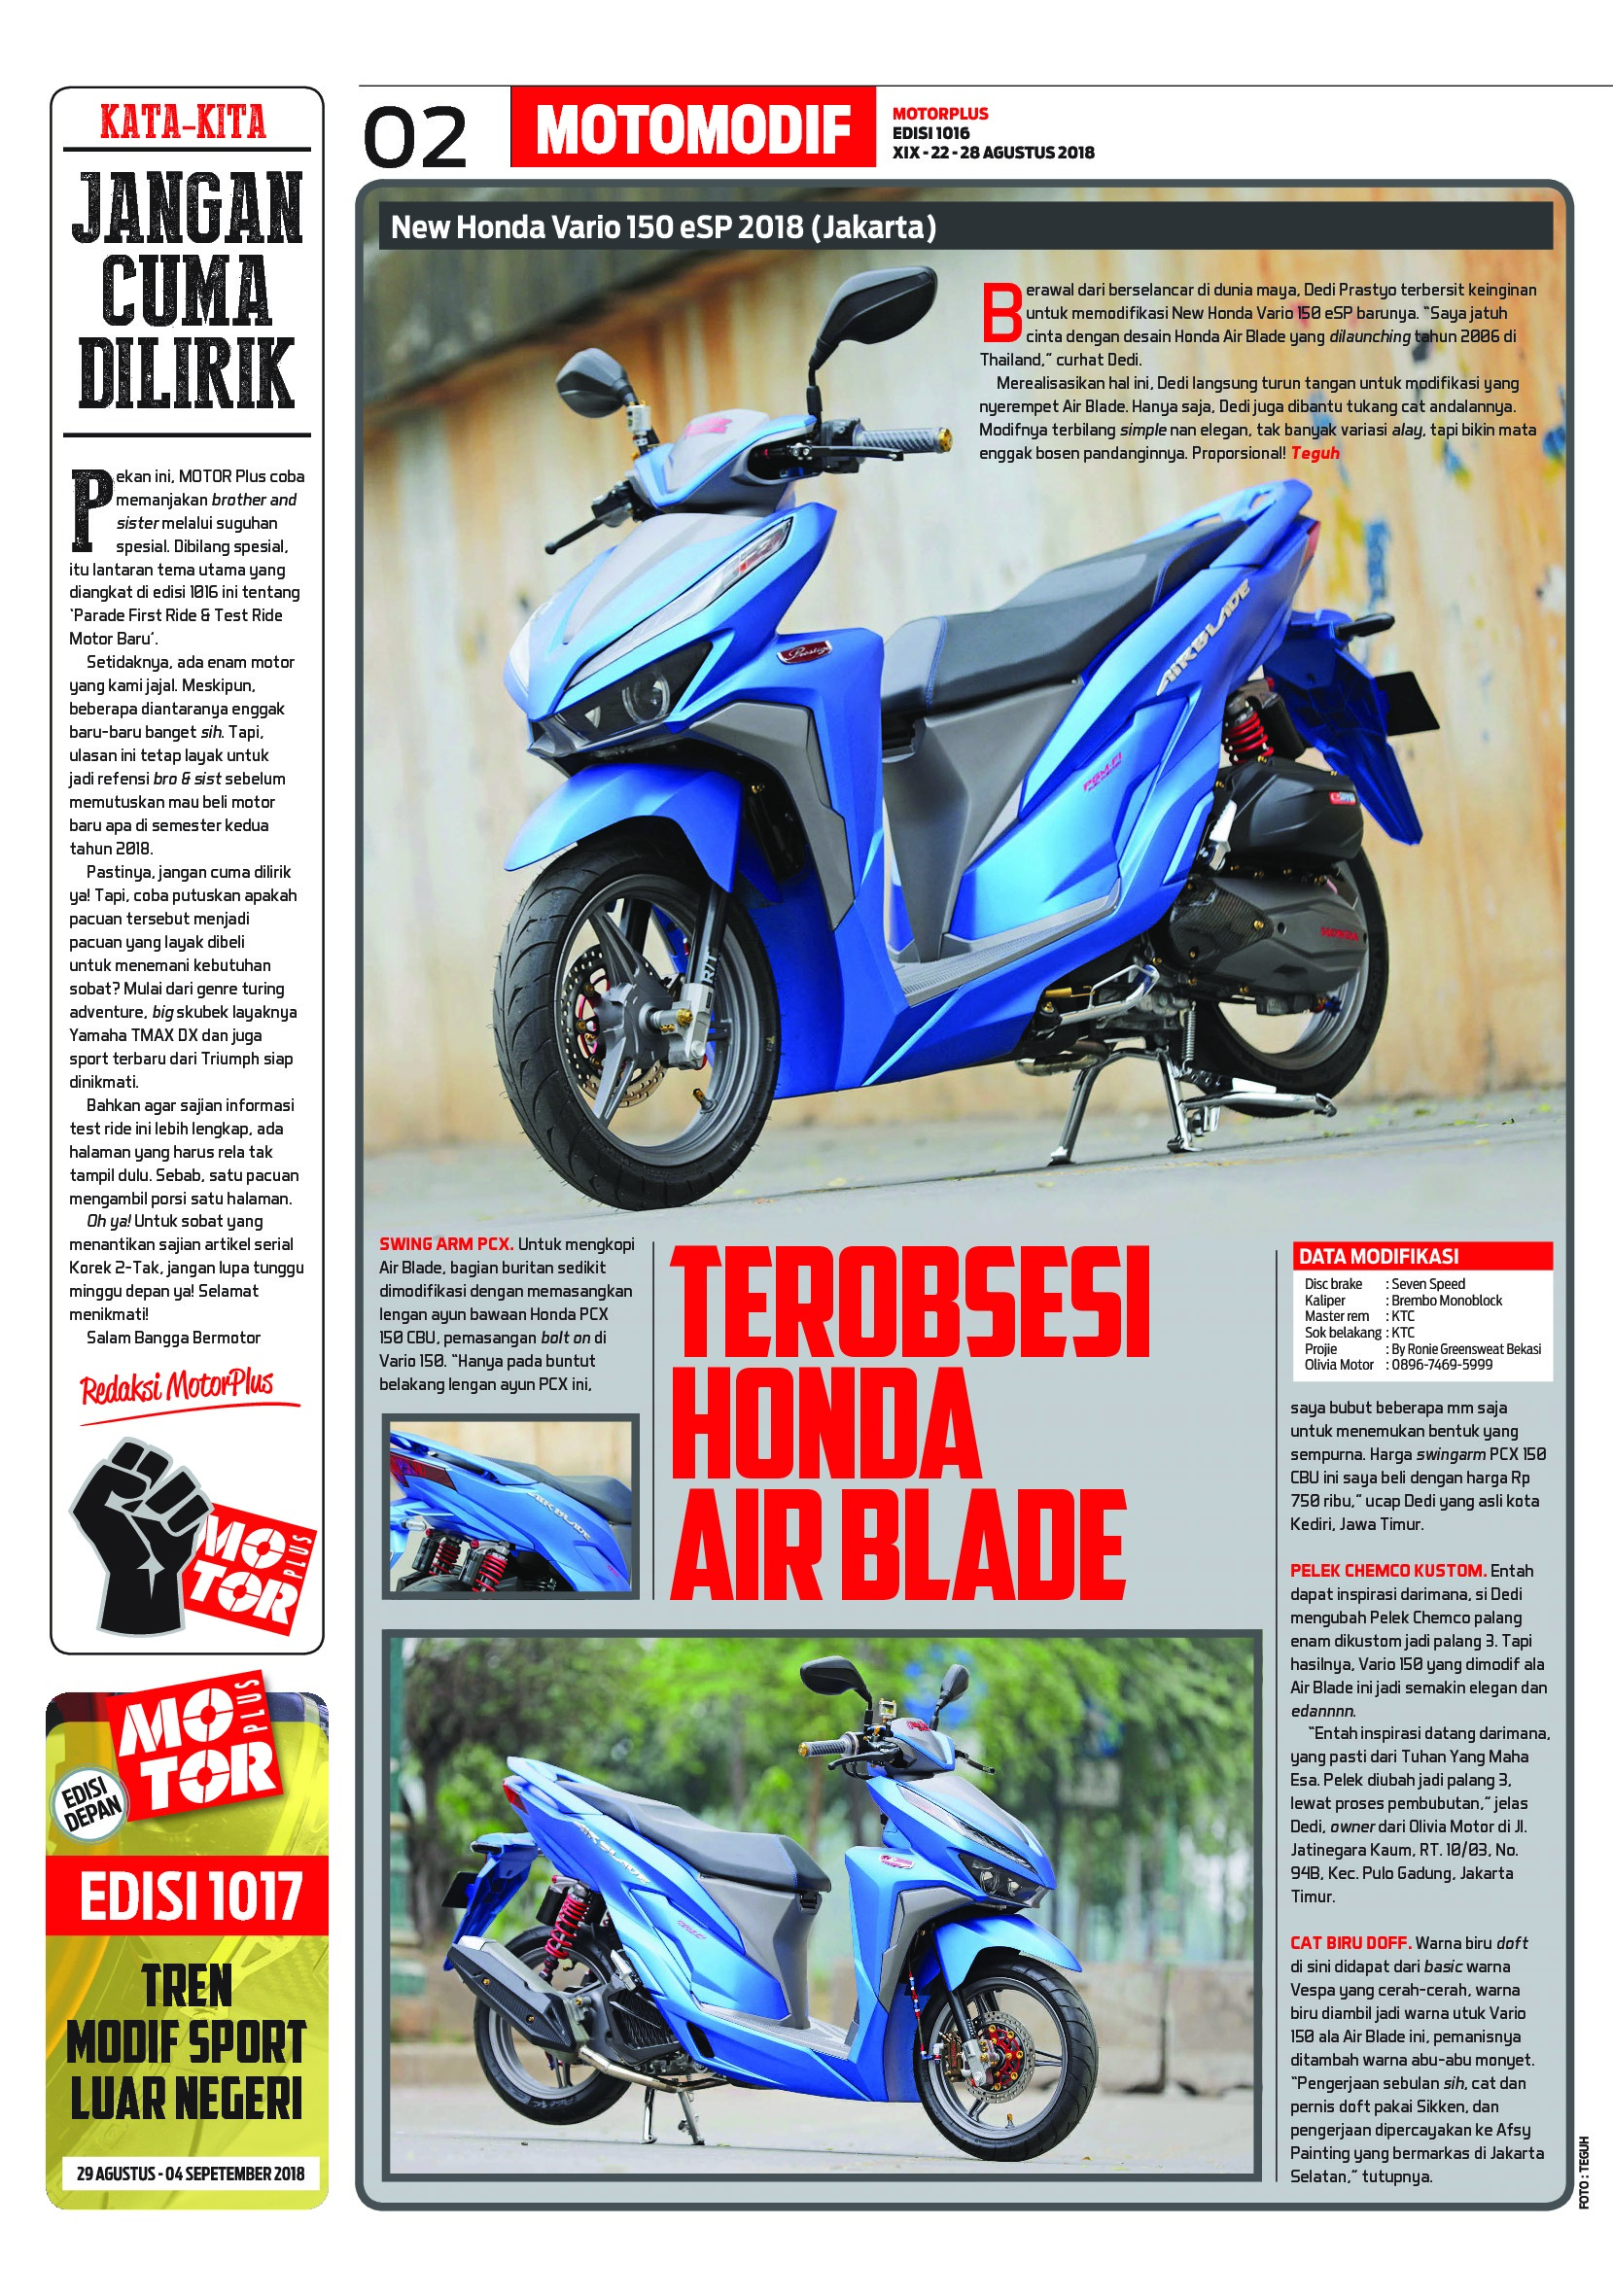 Motor Plus Magazine Ed 1016 August 2018 Gramedia Digital